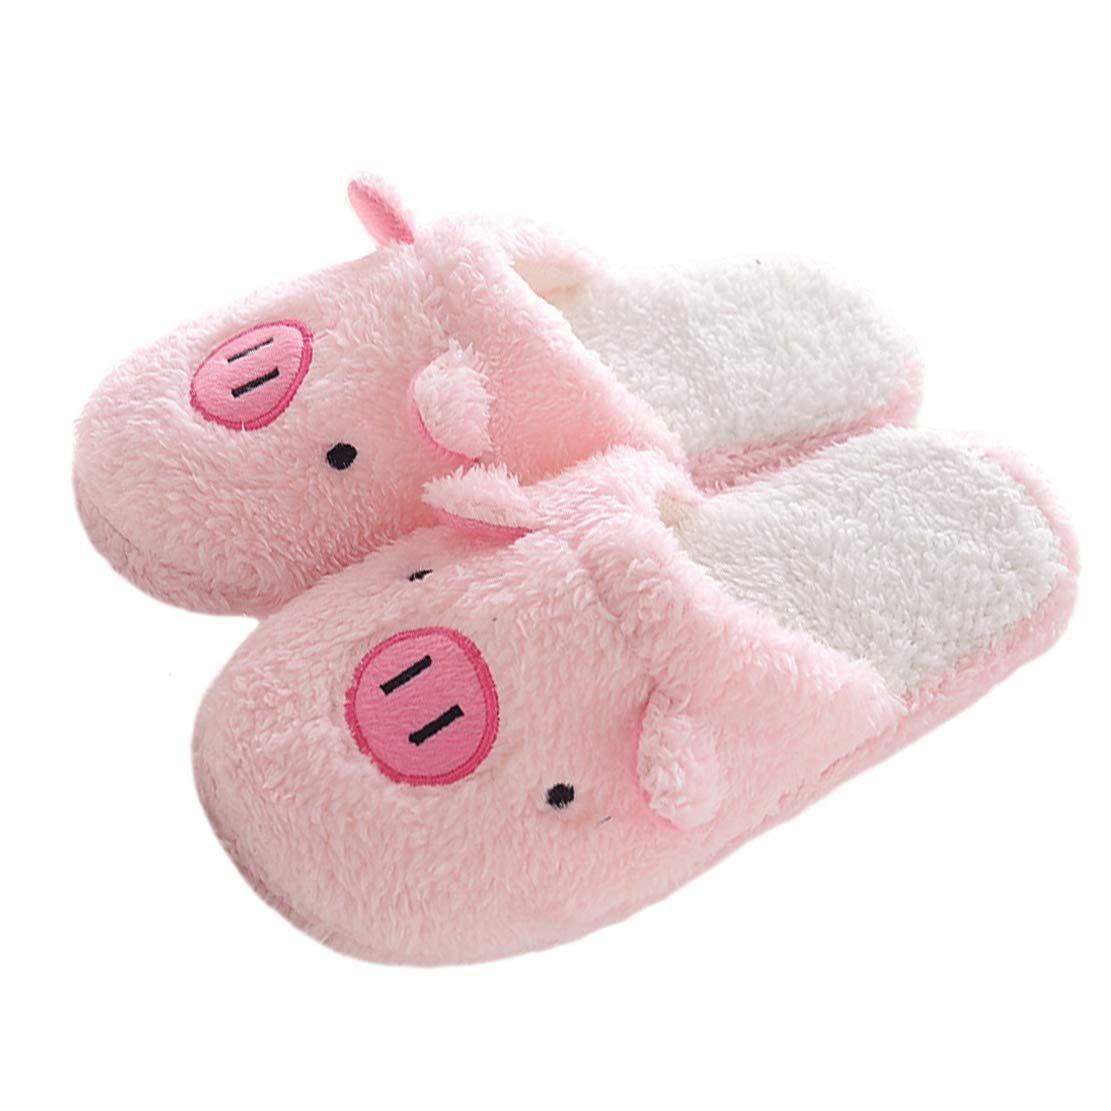 L-RUN Womens House Slipper Cotton Indoor Home Slipper Warm Pink